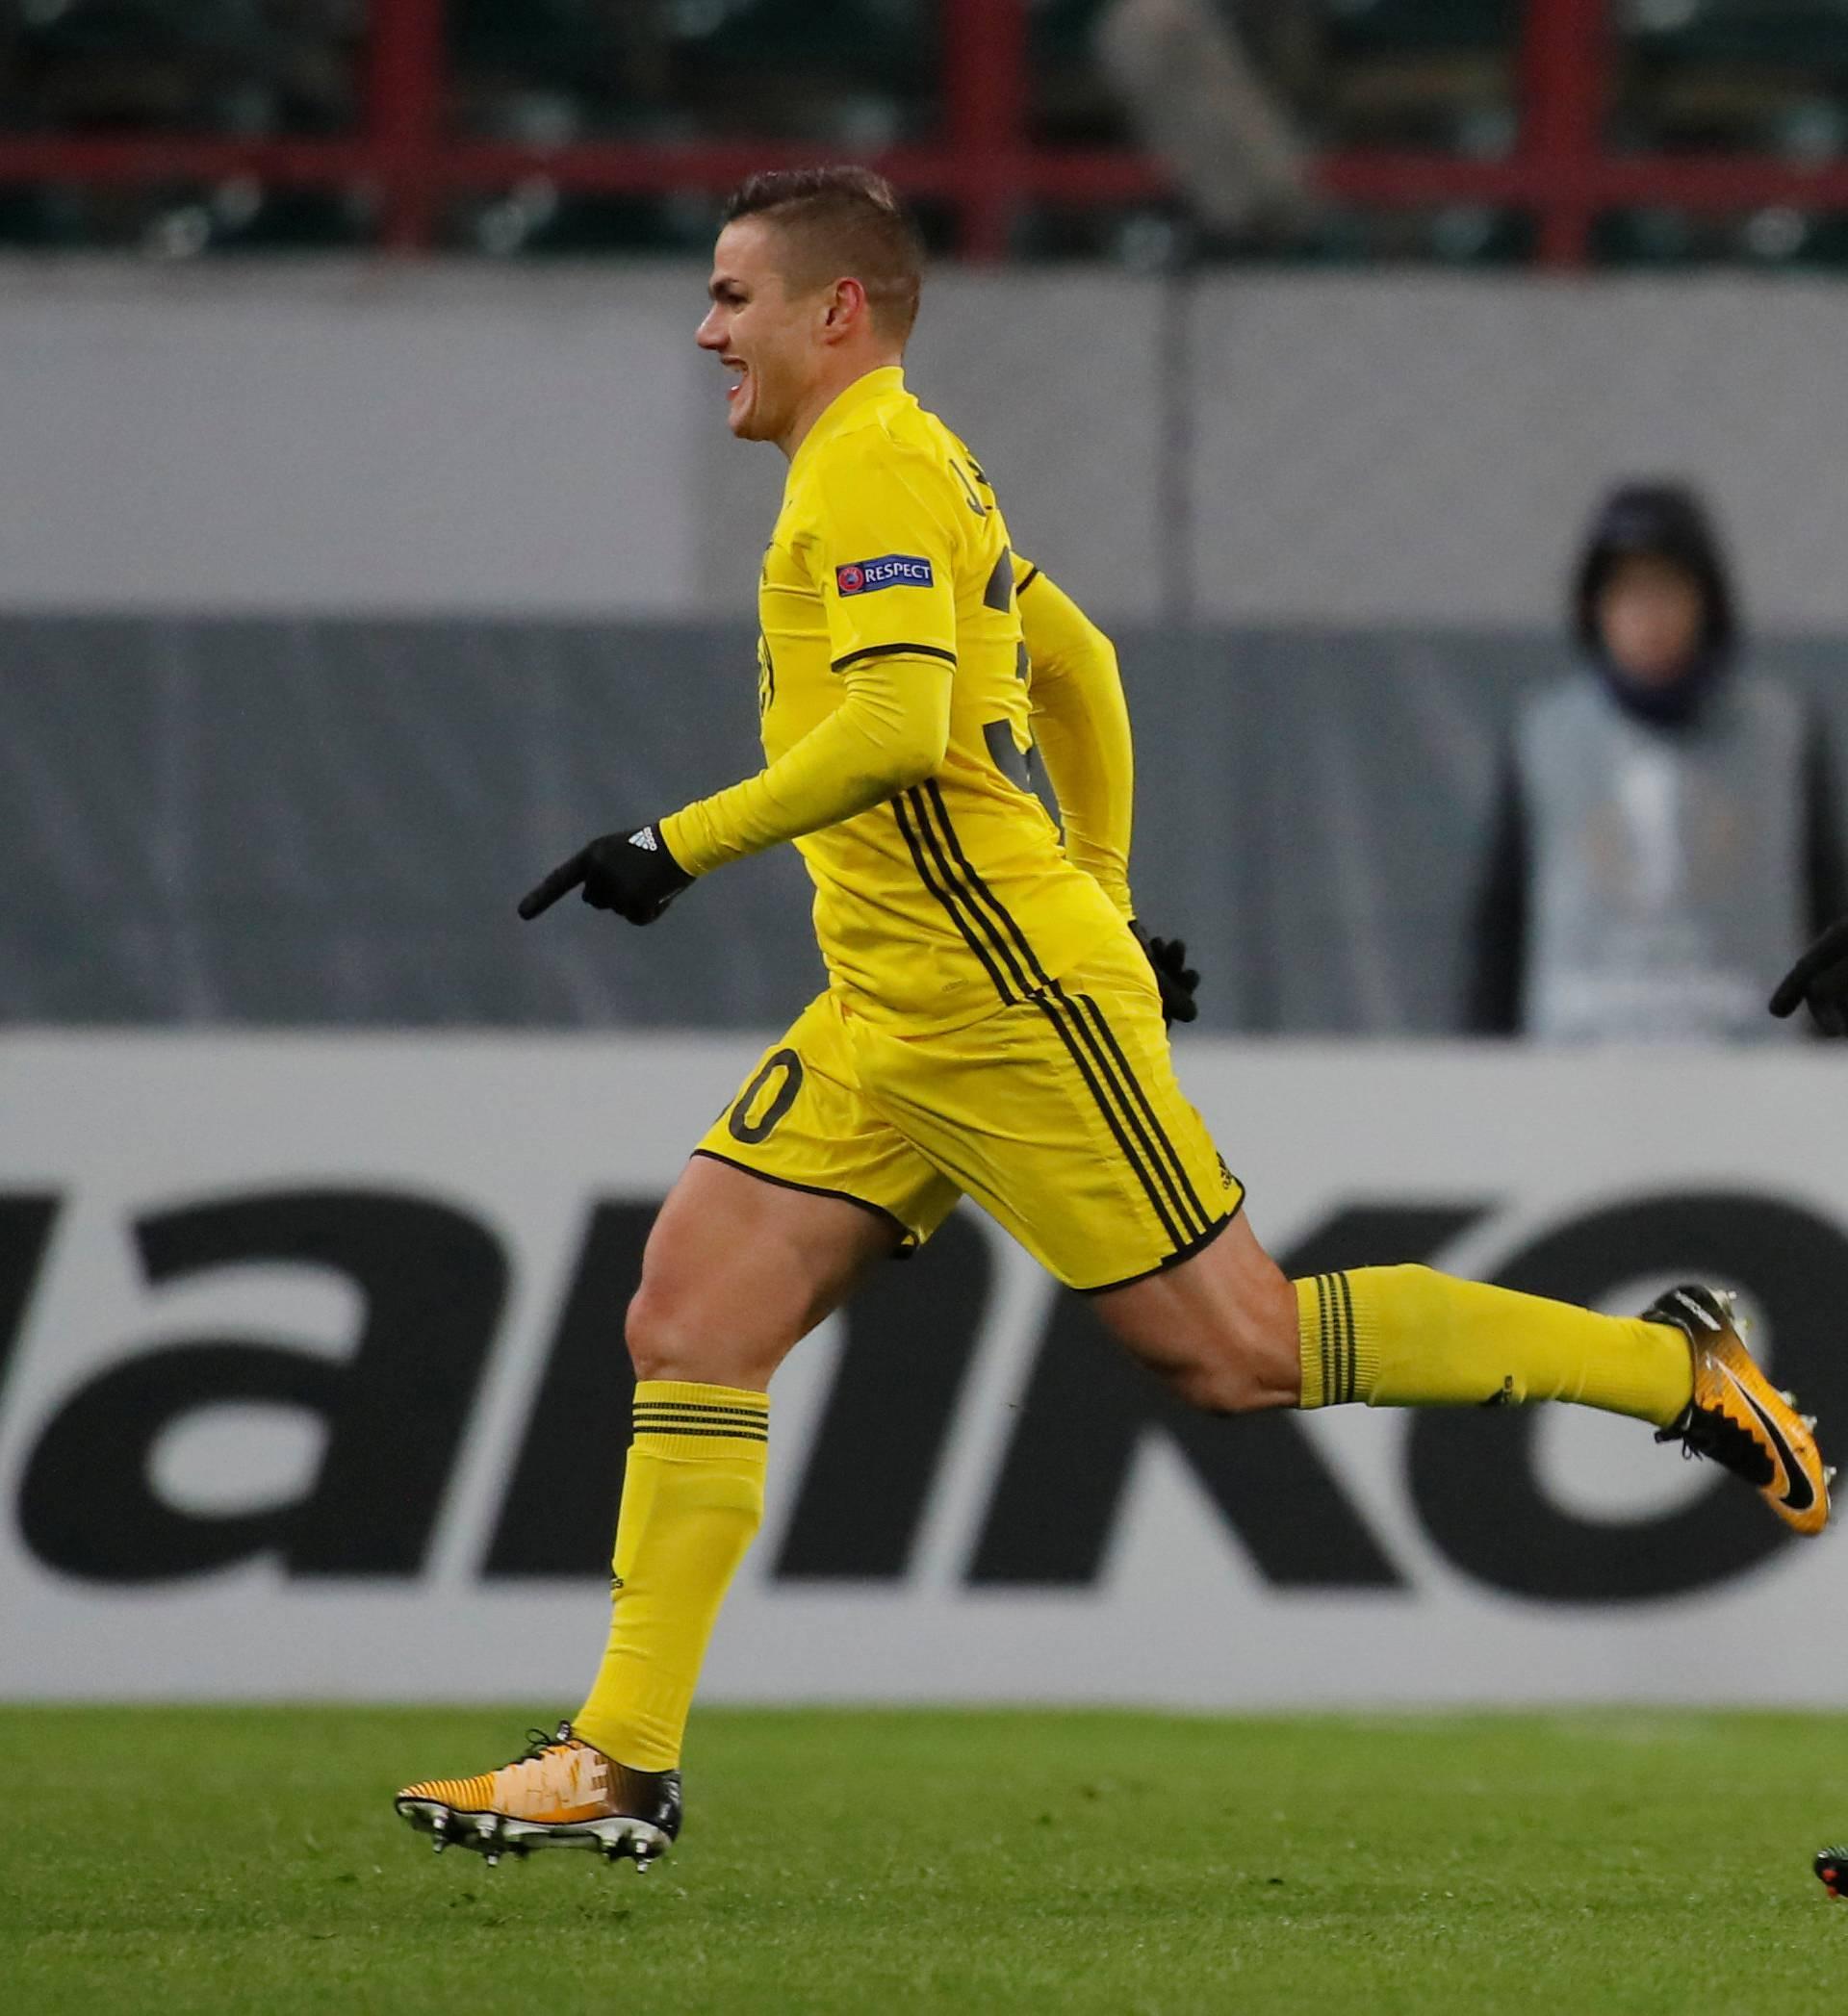 Europa League - Lokomotiv Moscow vs FC Sheriff Tiraspol